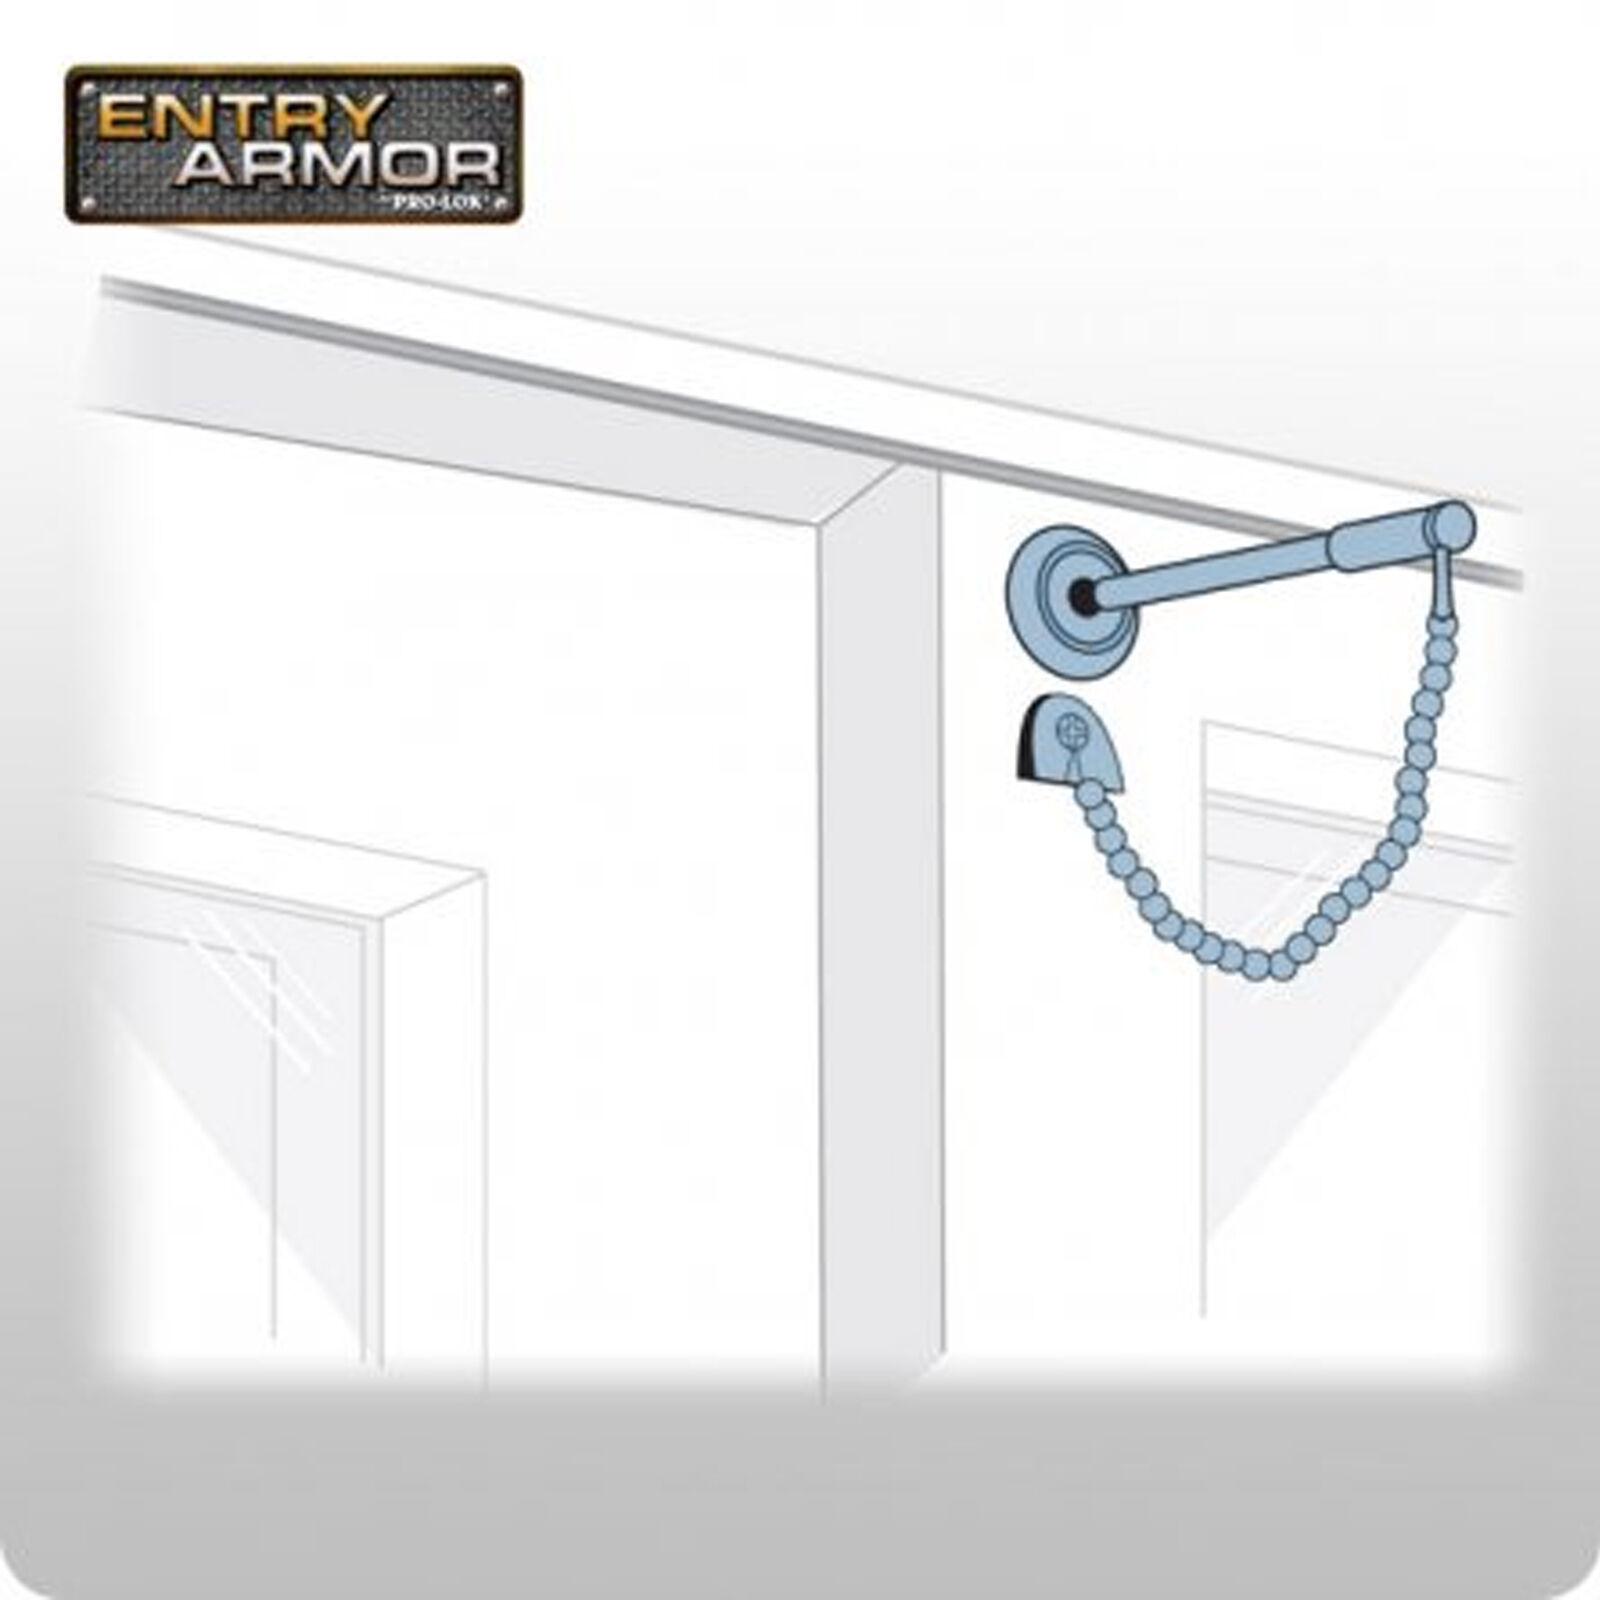 Patio Door Pin Lock Sliding Door Window Lock Made By Entry A